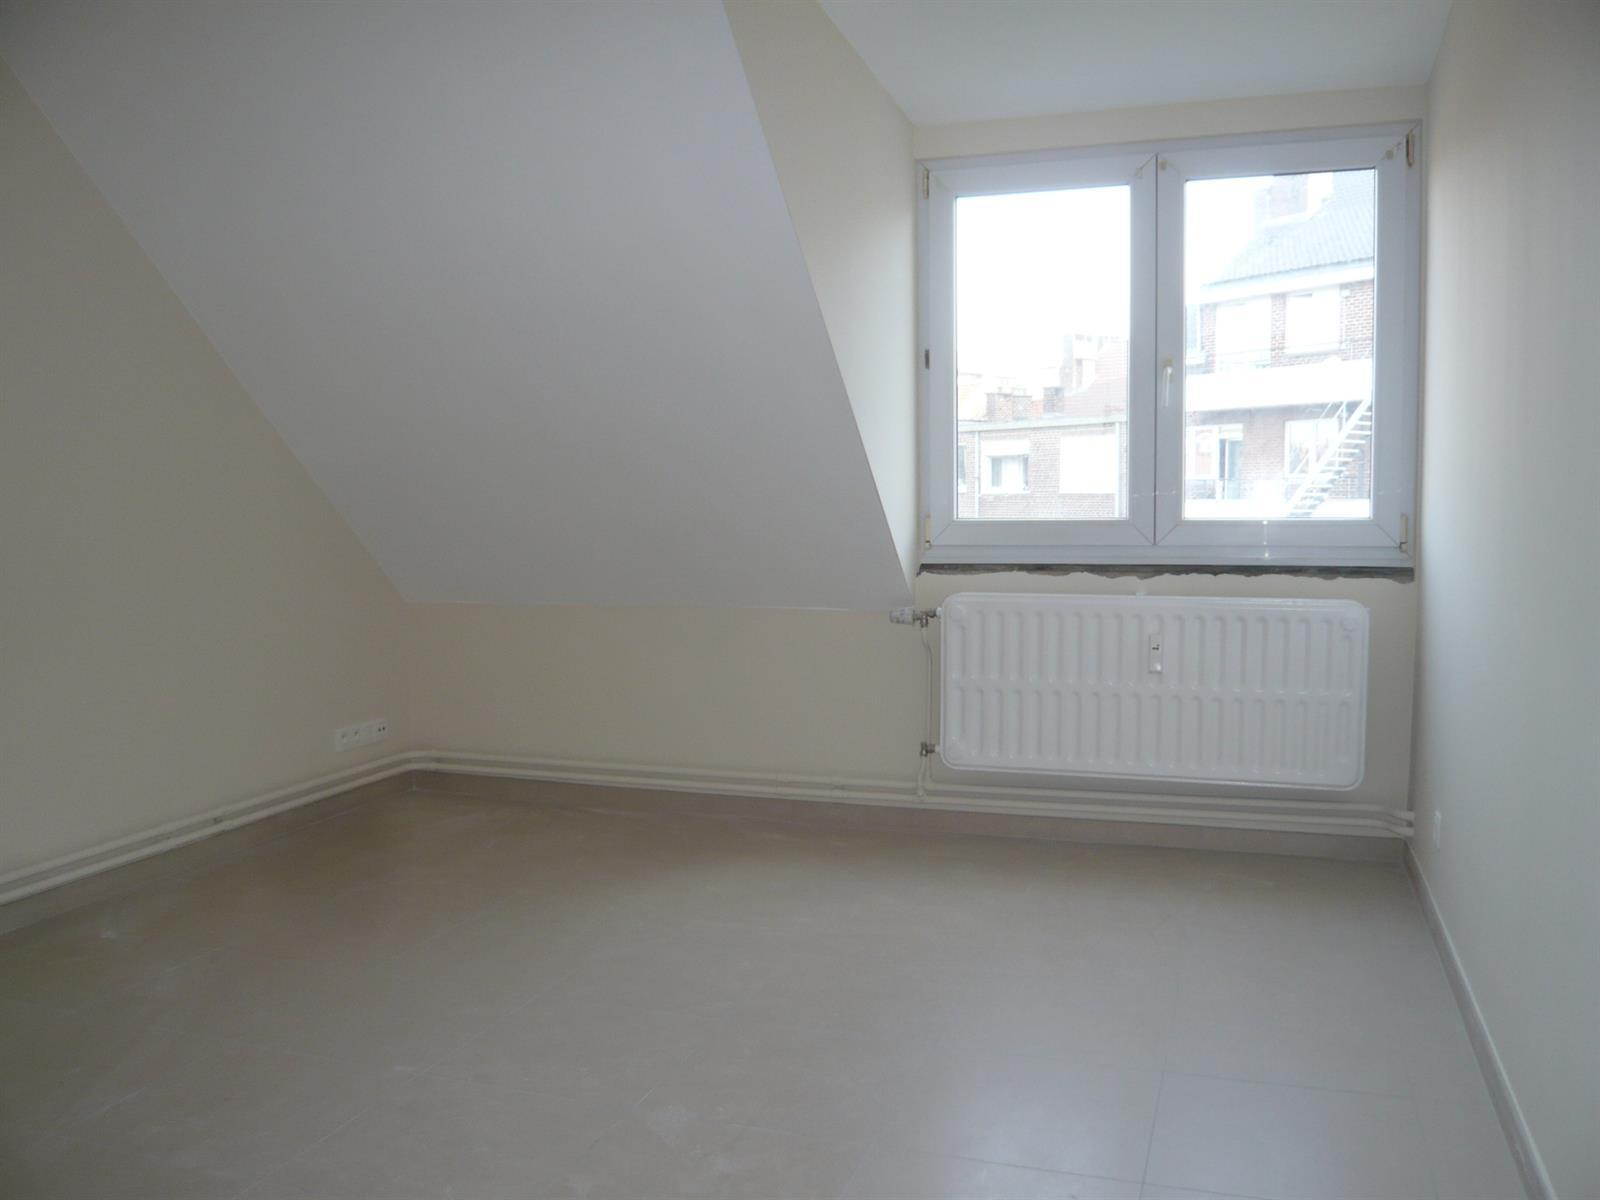 Appartement - Woluwe-Saint-Lambert - #3956338-16